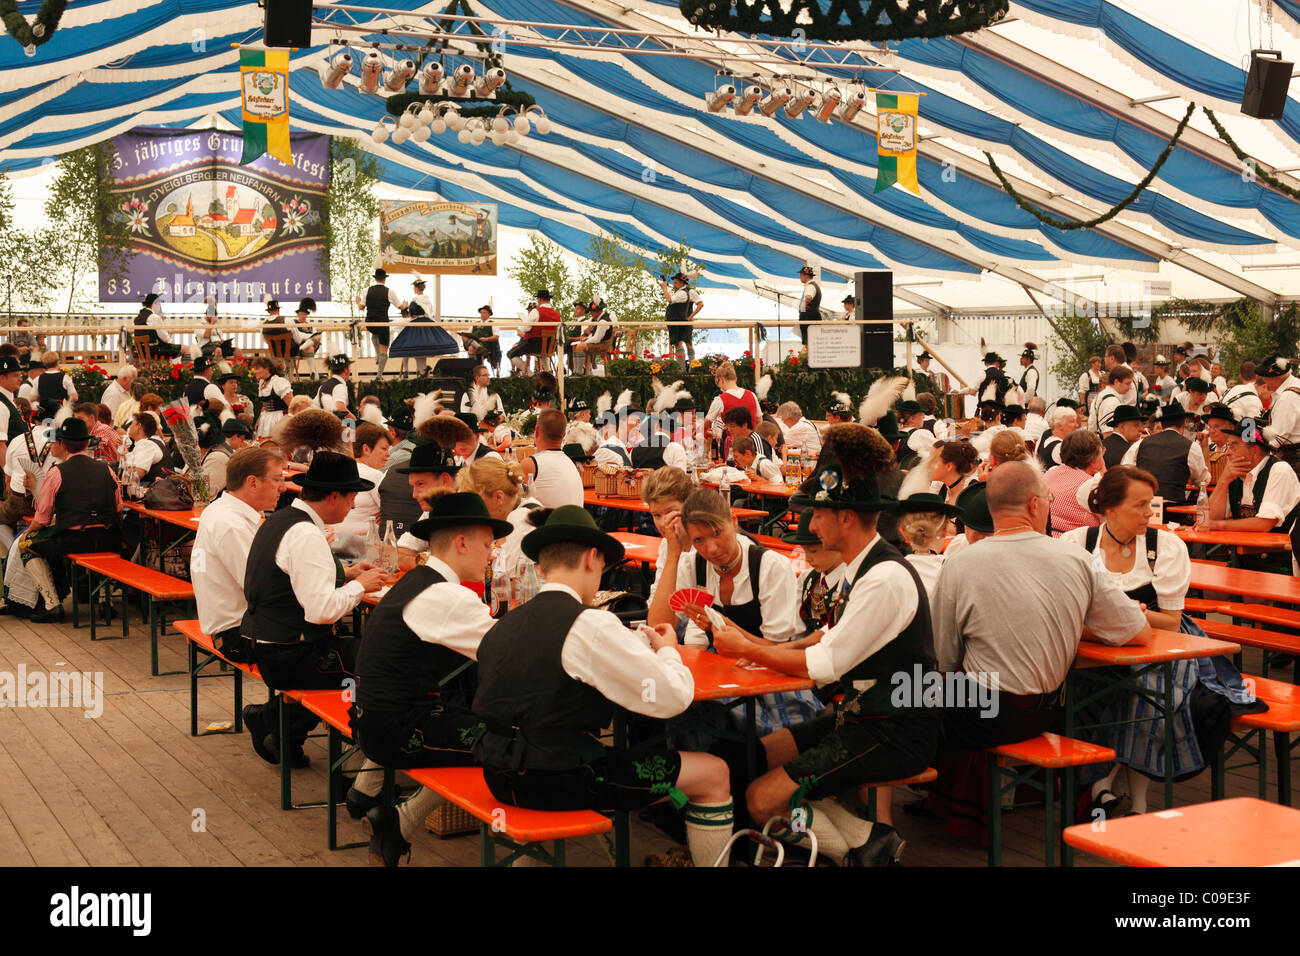 Festival carpa Marquee, 83ª Loisachgaufest en Neufahrn cerca Egling, Alta Baviera, Baviera, Alemania, Europa Foto de stock